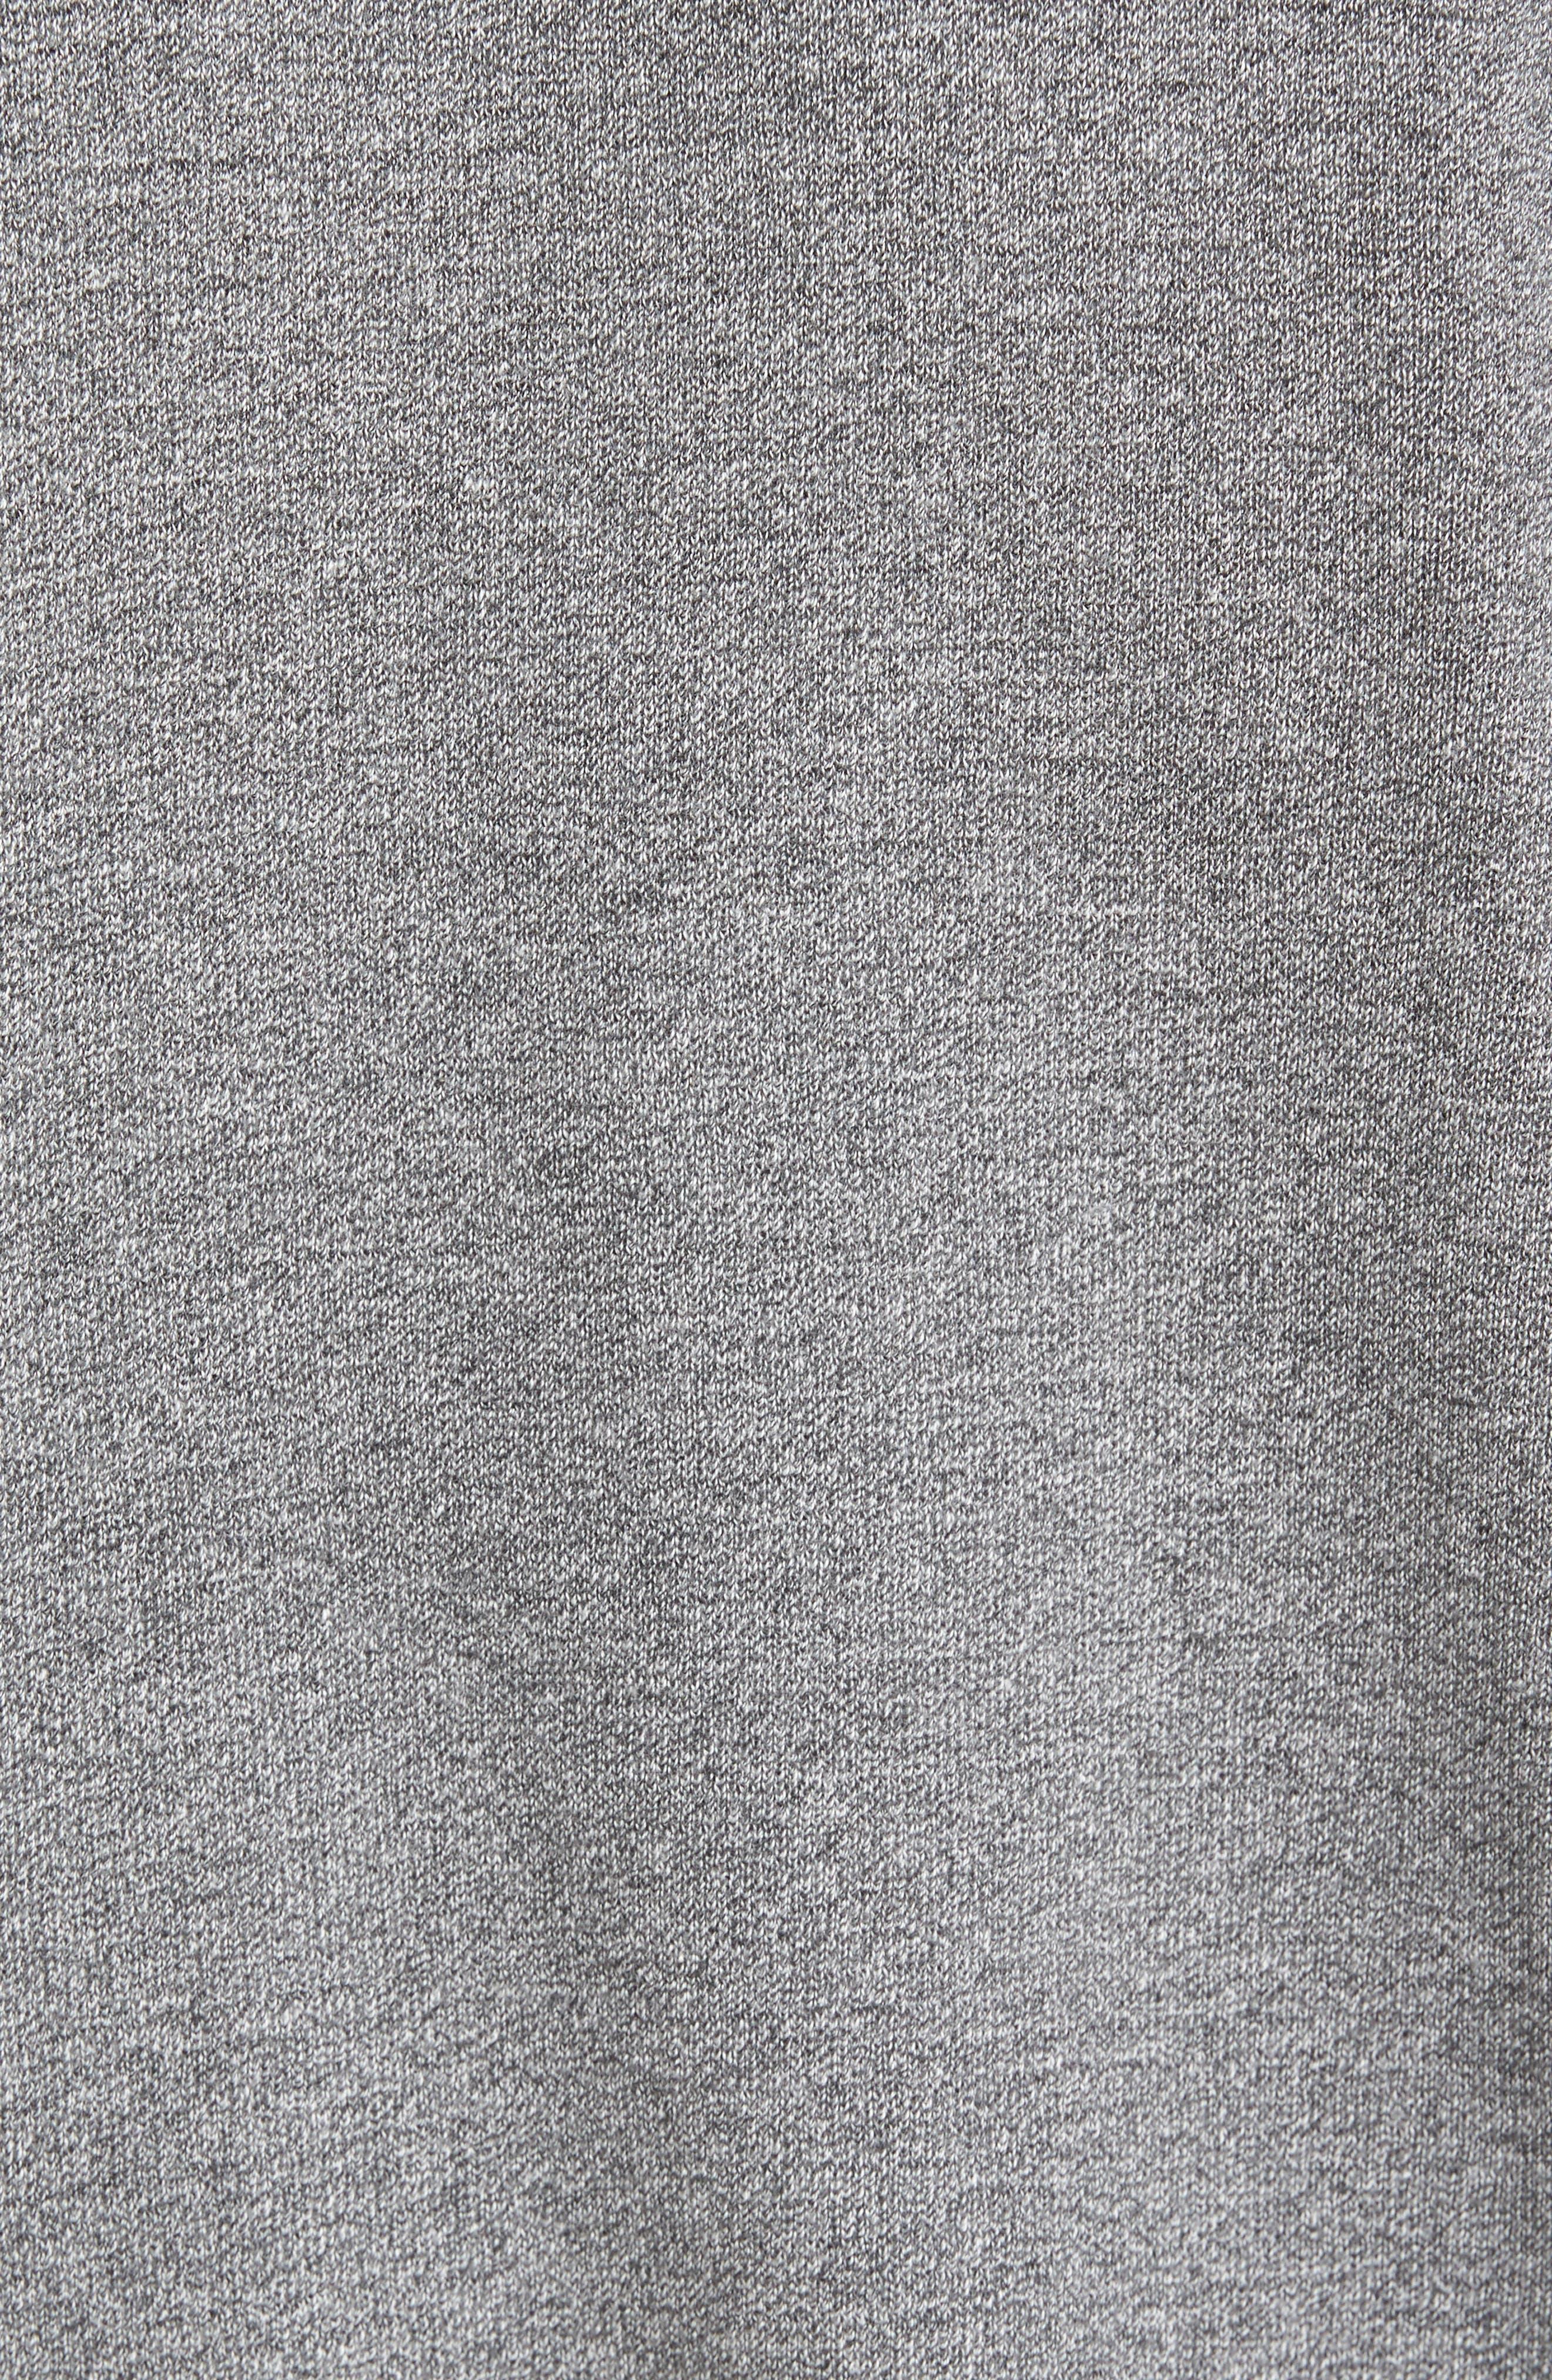 NFL Stitch of Liberty Embroidered Crewneck Sweatshirt,                             Alternate thumbnail 139, color,